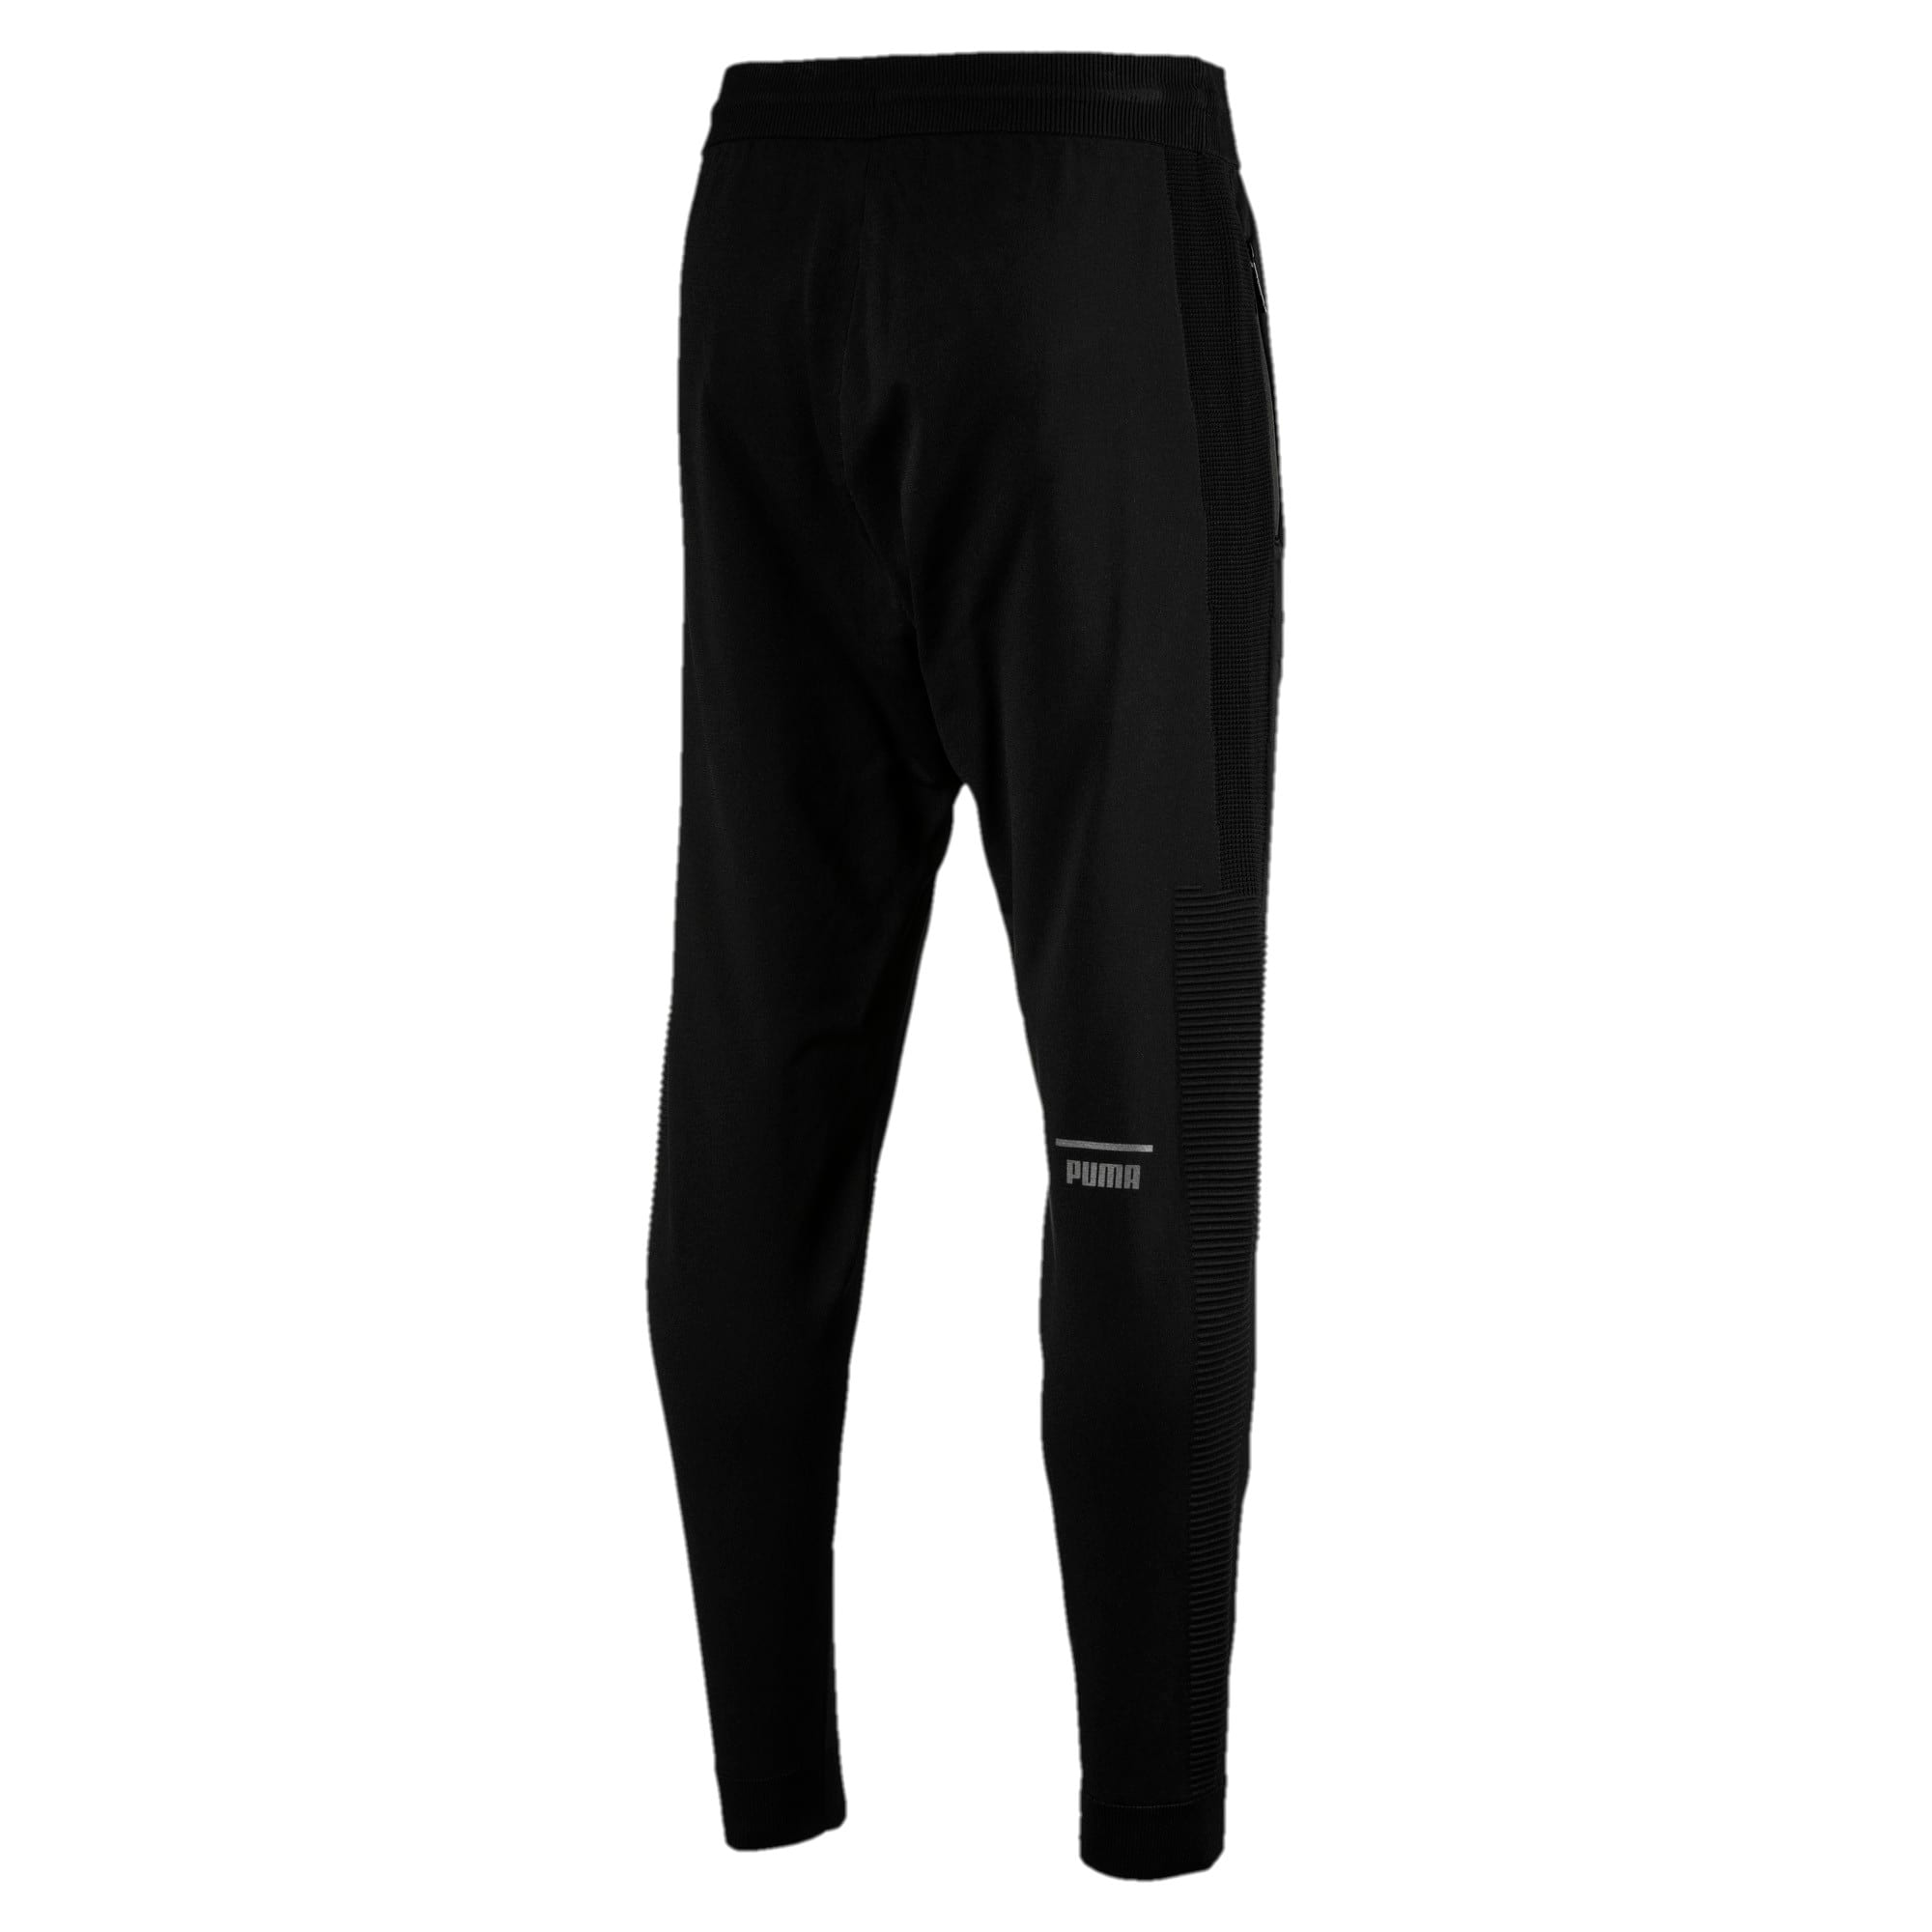 Thumbnail 4 of Pace evoKNIT Move Men's Sweatpants, Puma Black, medium